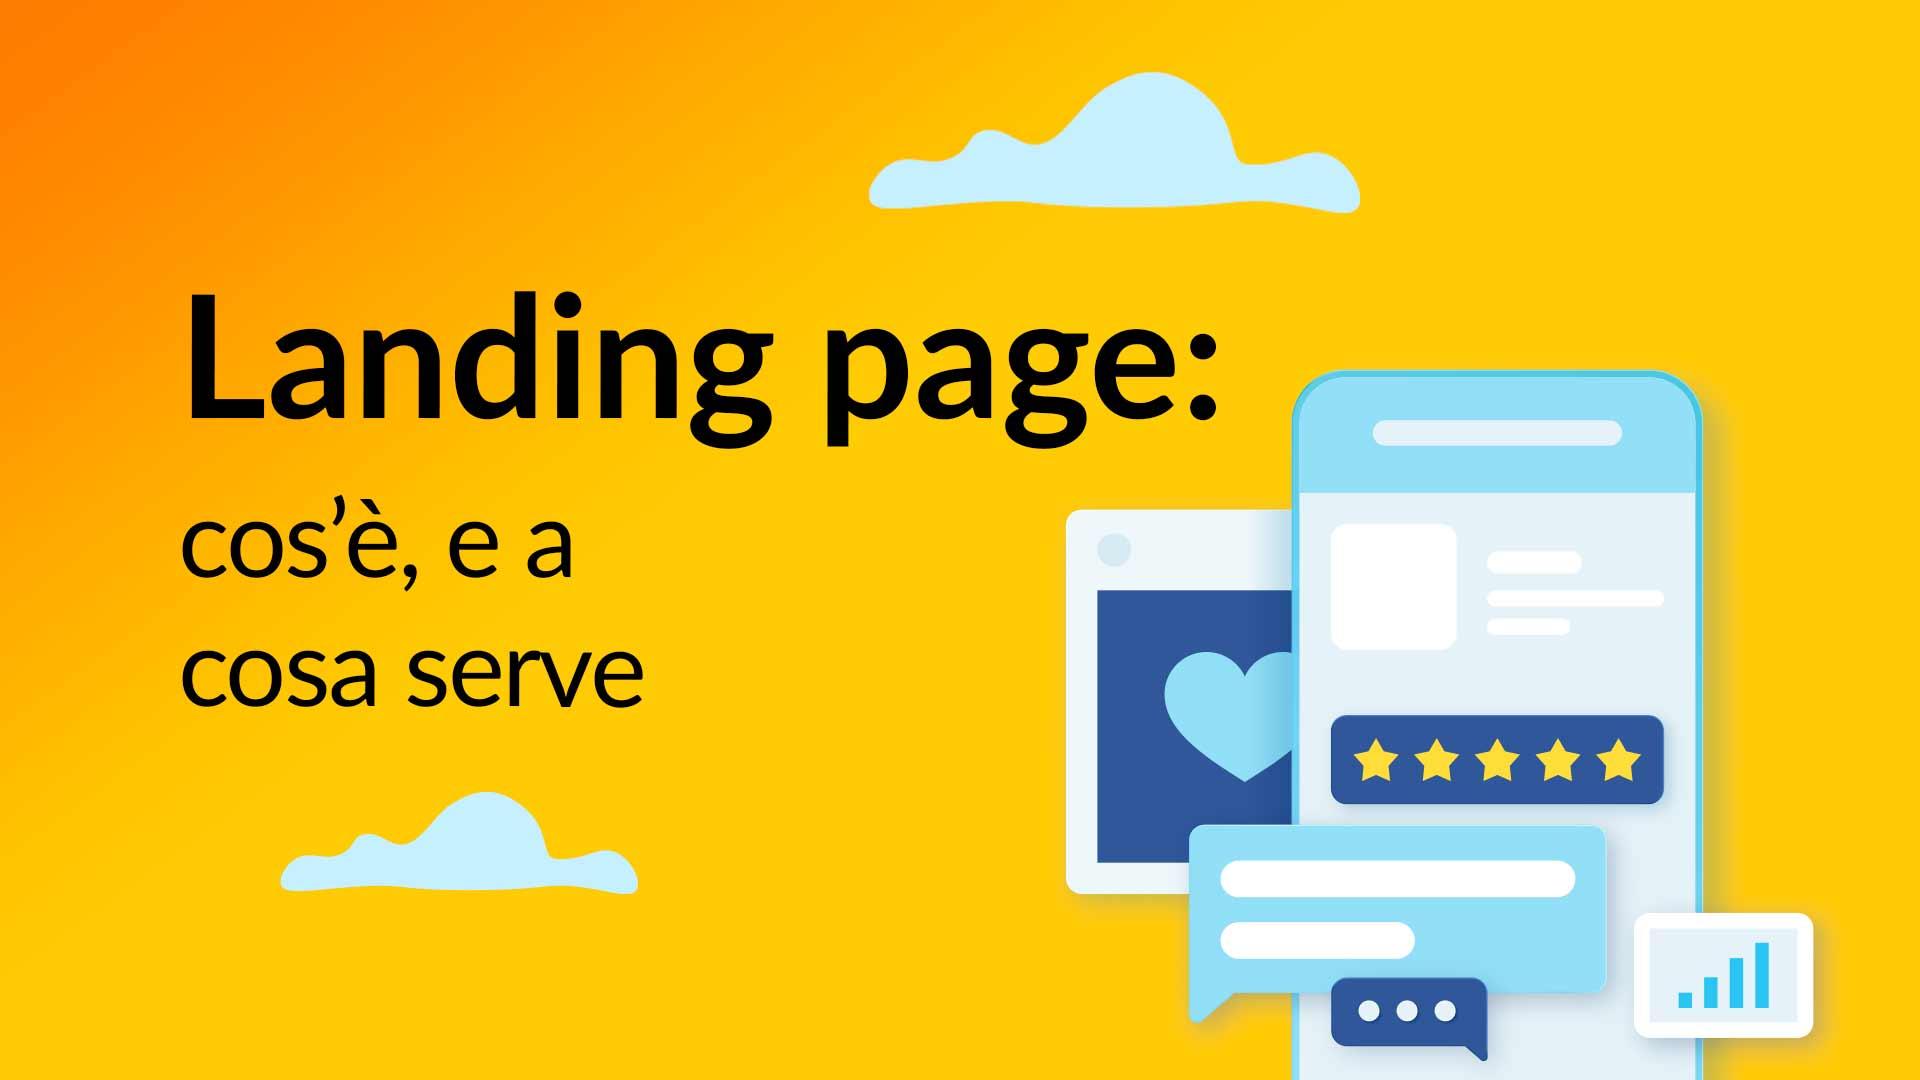 Landing page: cos'è e a cosa serve